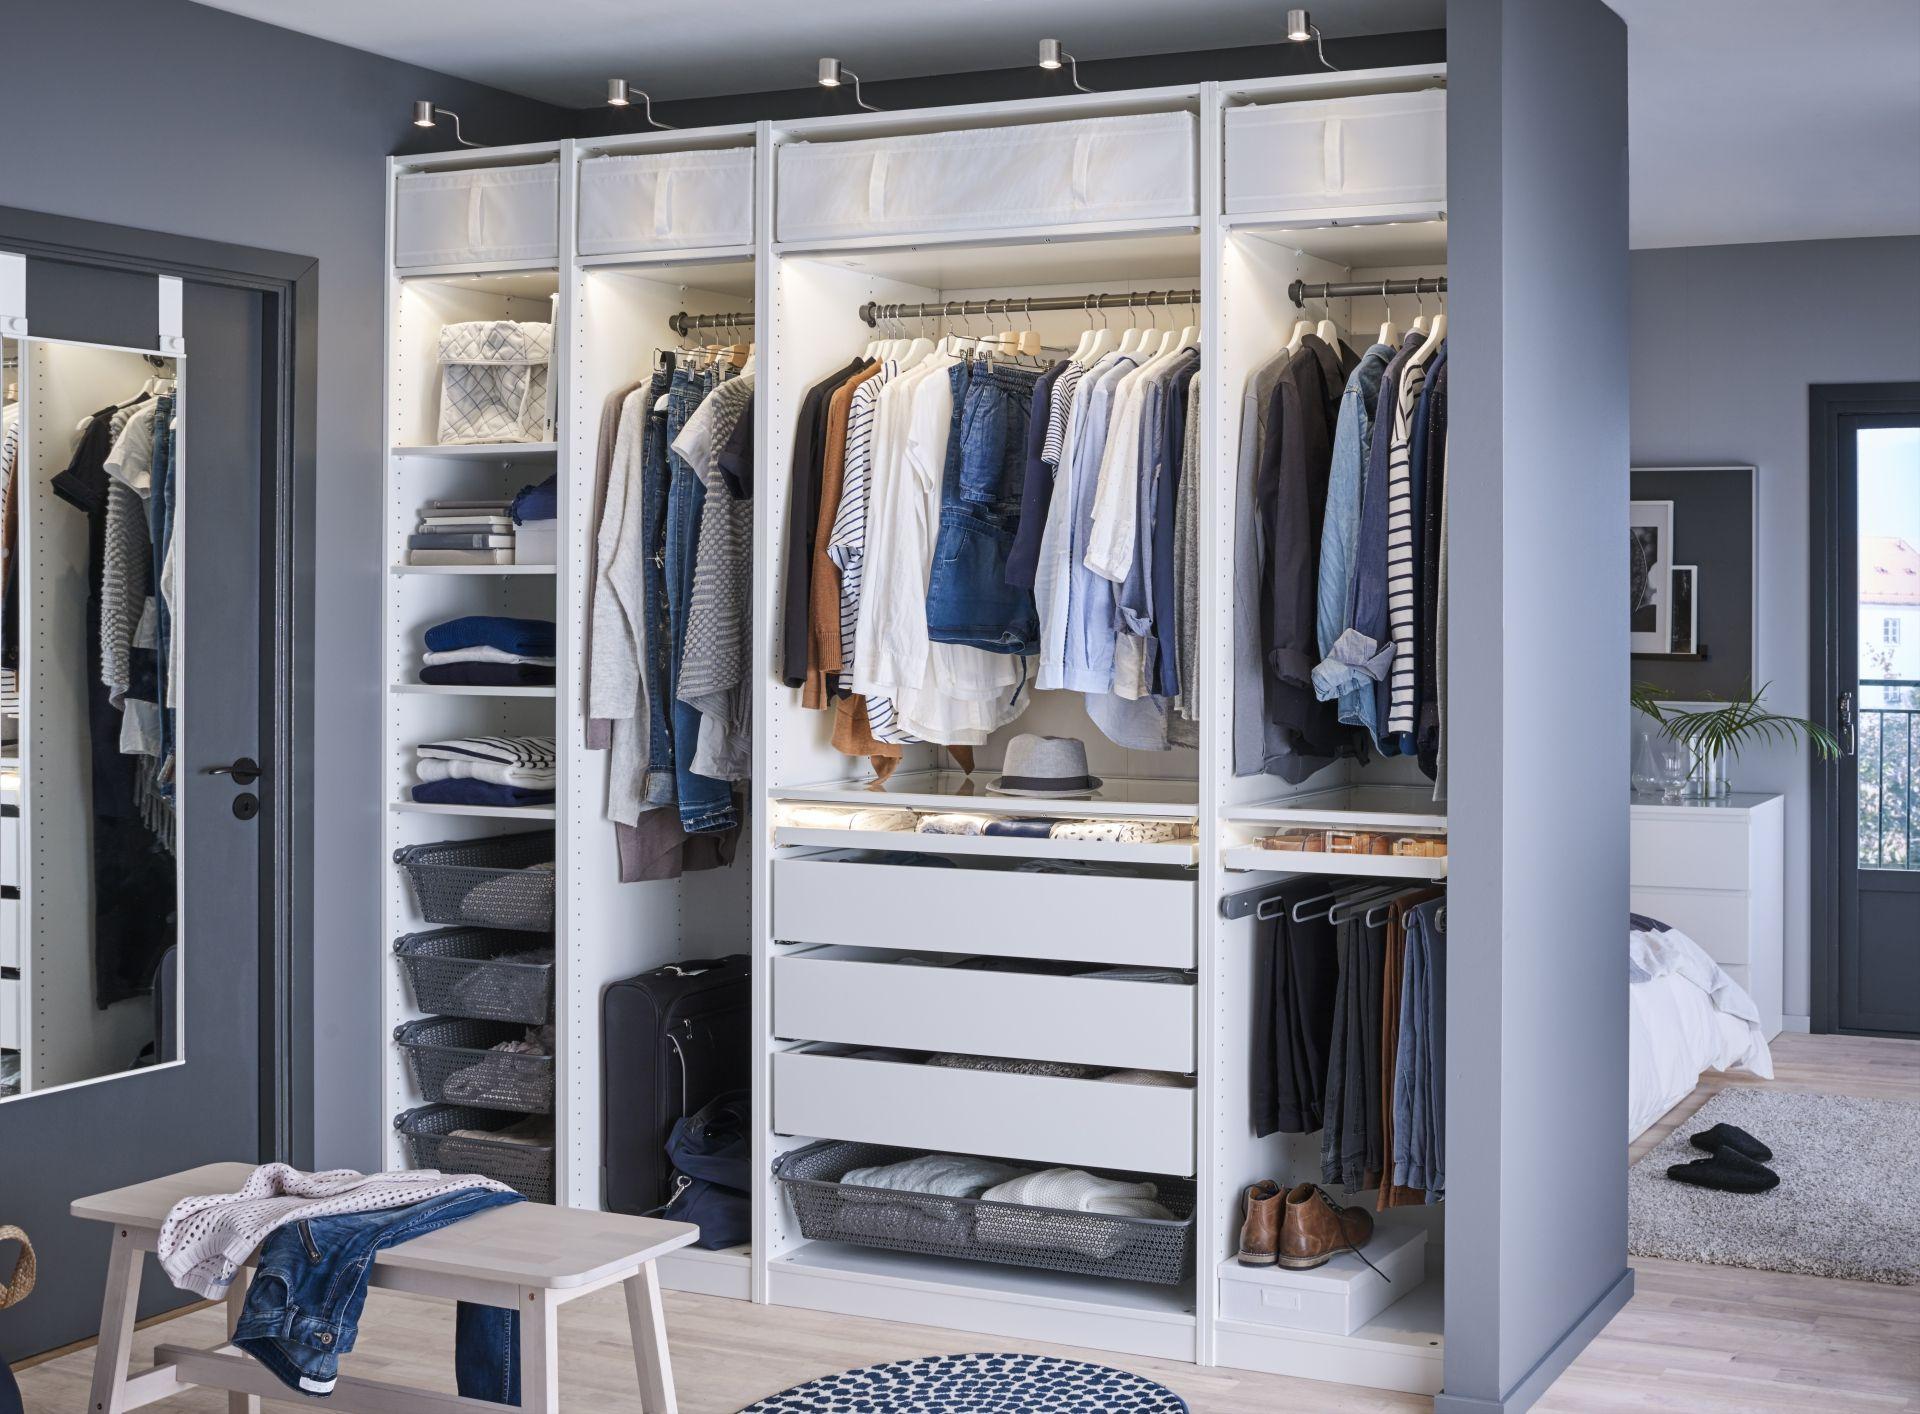 Ikea Nederland Interieur Online Bestellen Slaapkamer Kast